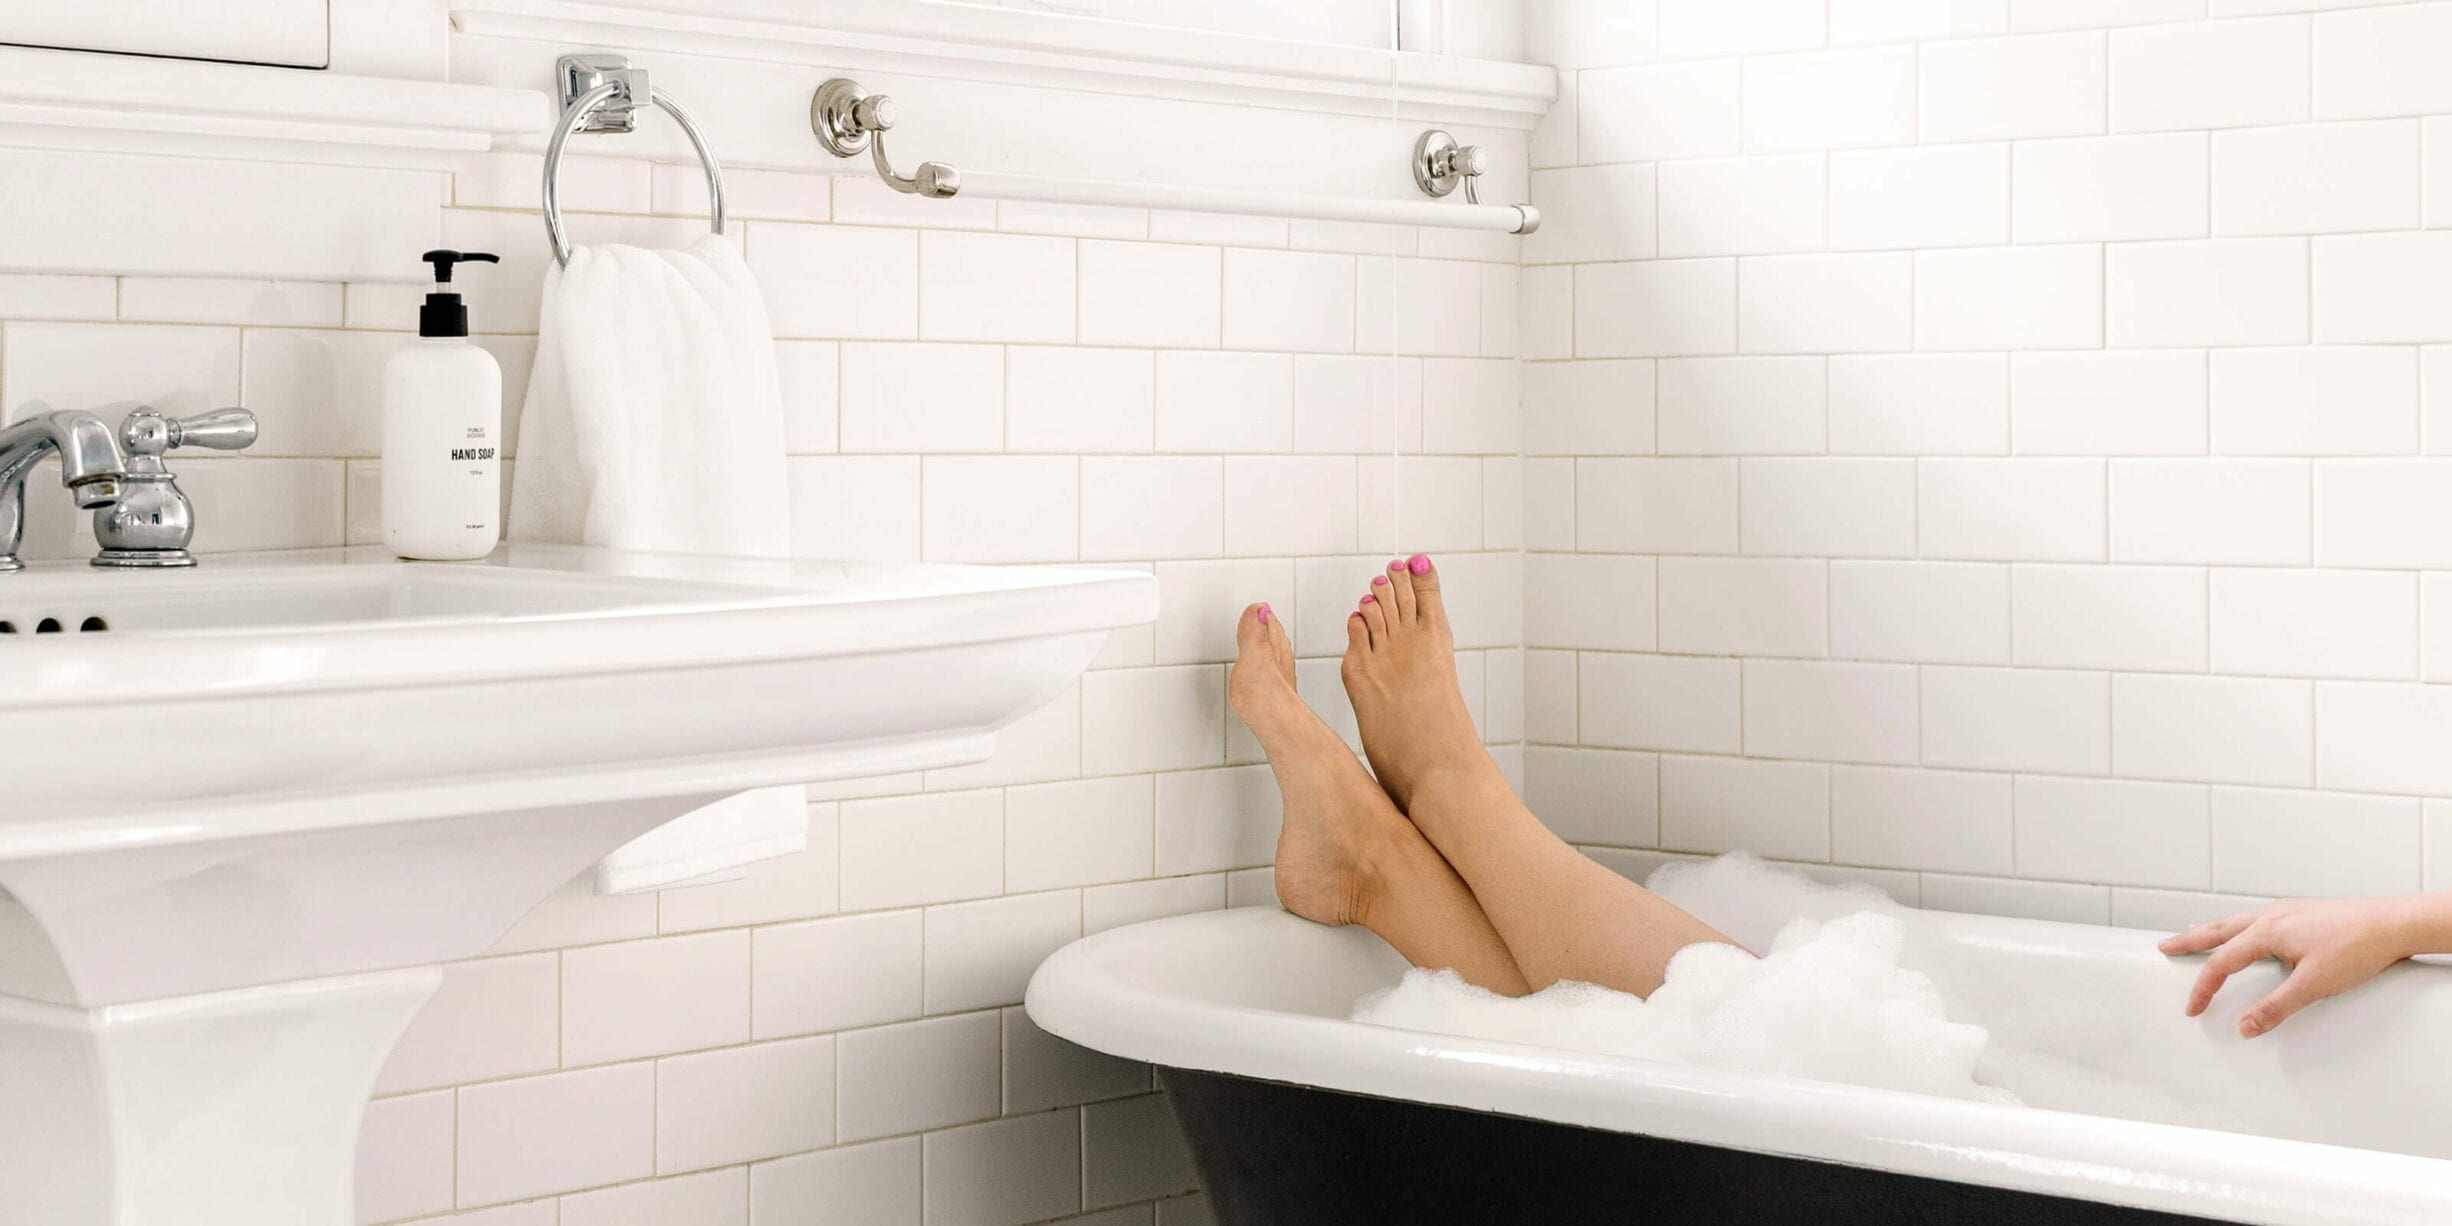 woman in bathtub, soap bubbles, public goods hand soap